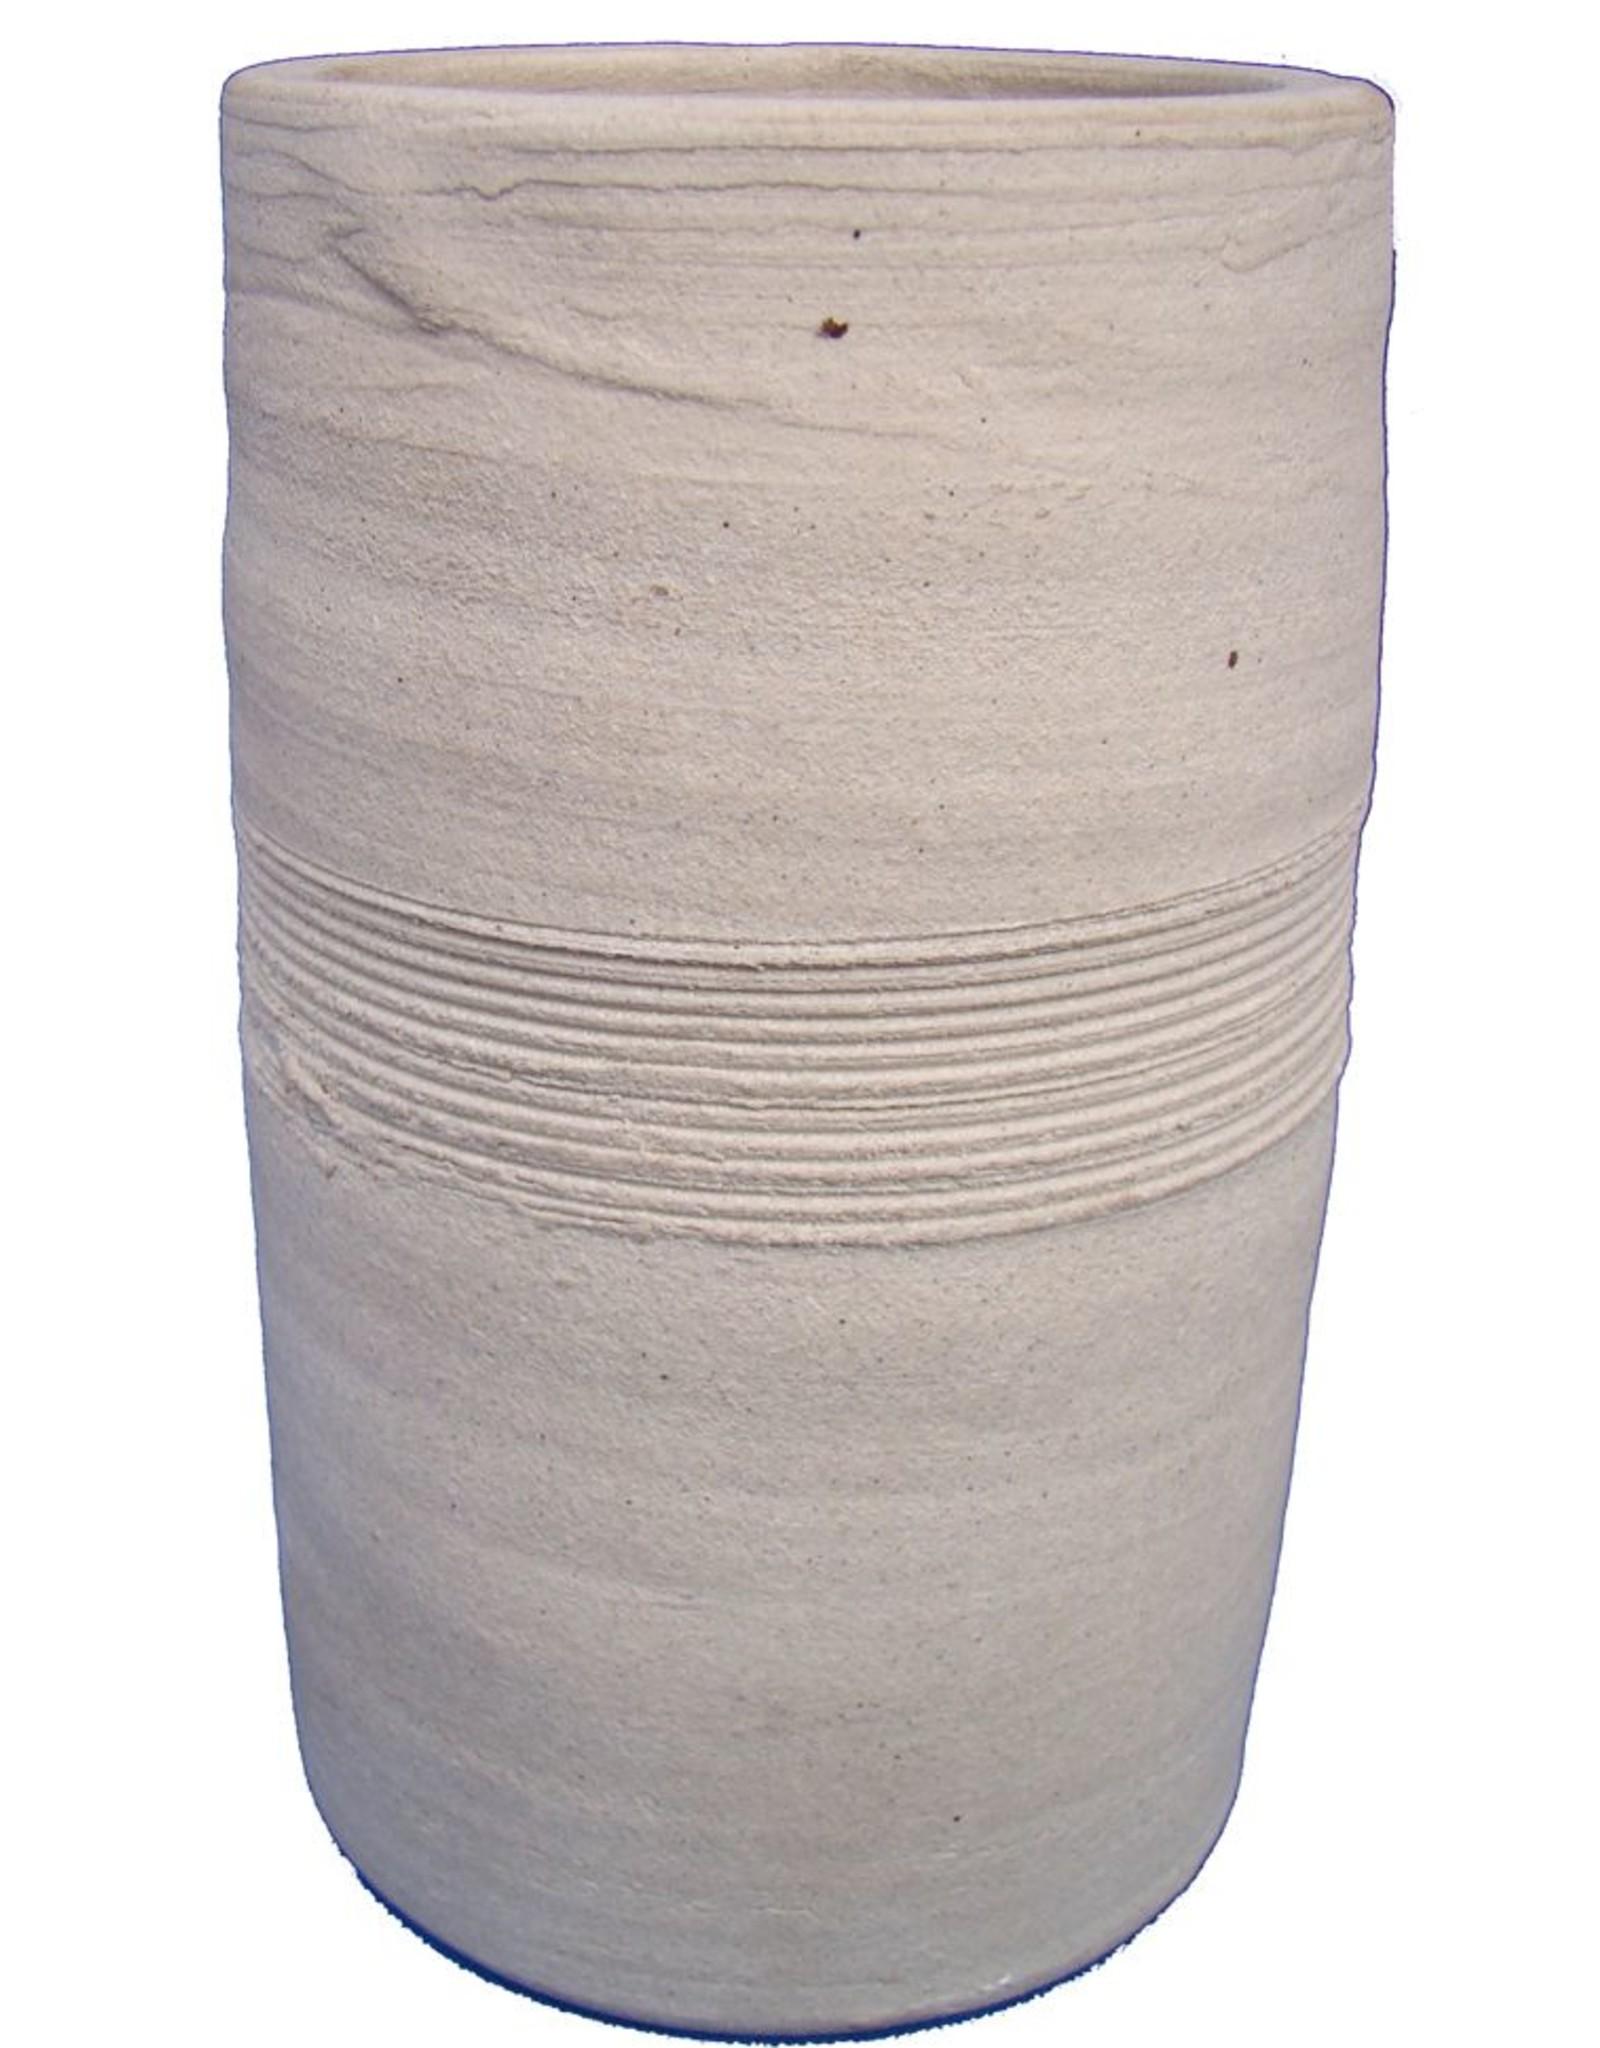 Potclays 1142-30 New White Grog Stoneware (Firing Range 1220˚C-1300˚C) 12.5kg